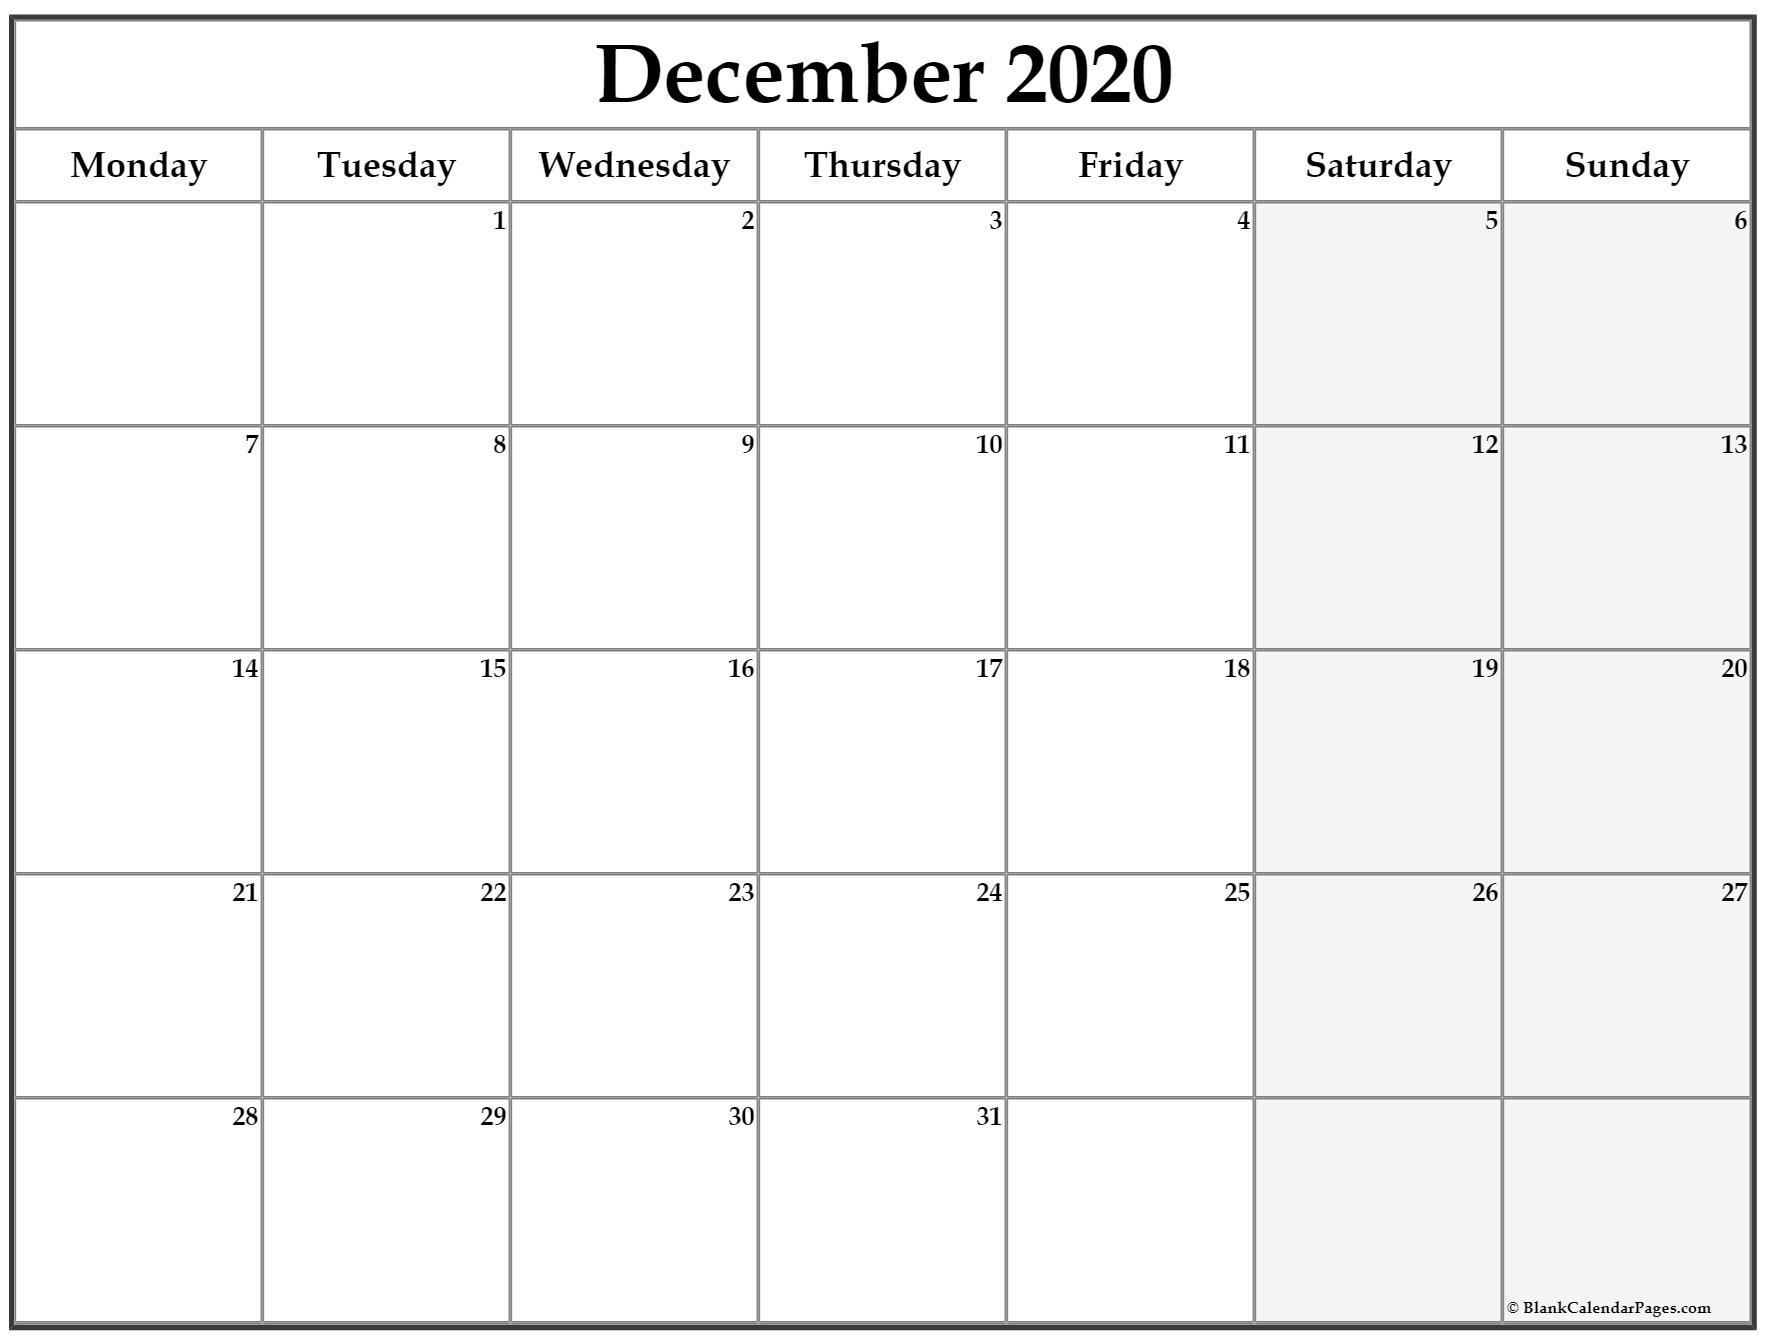 December 2020 Monday Calendar | Monday To Sunday inside Monday Through Saturday Calendar